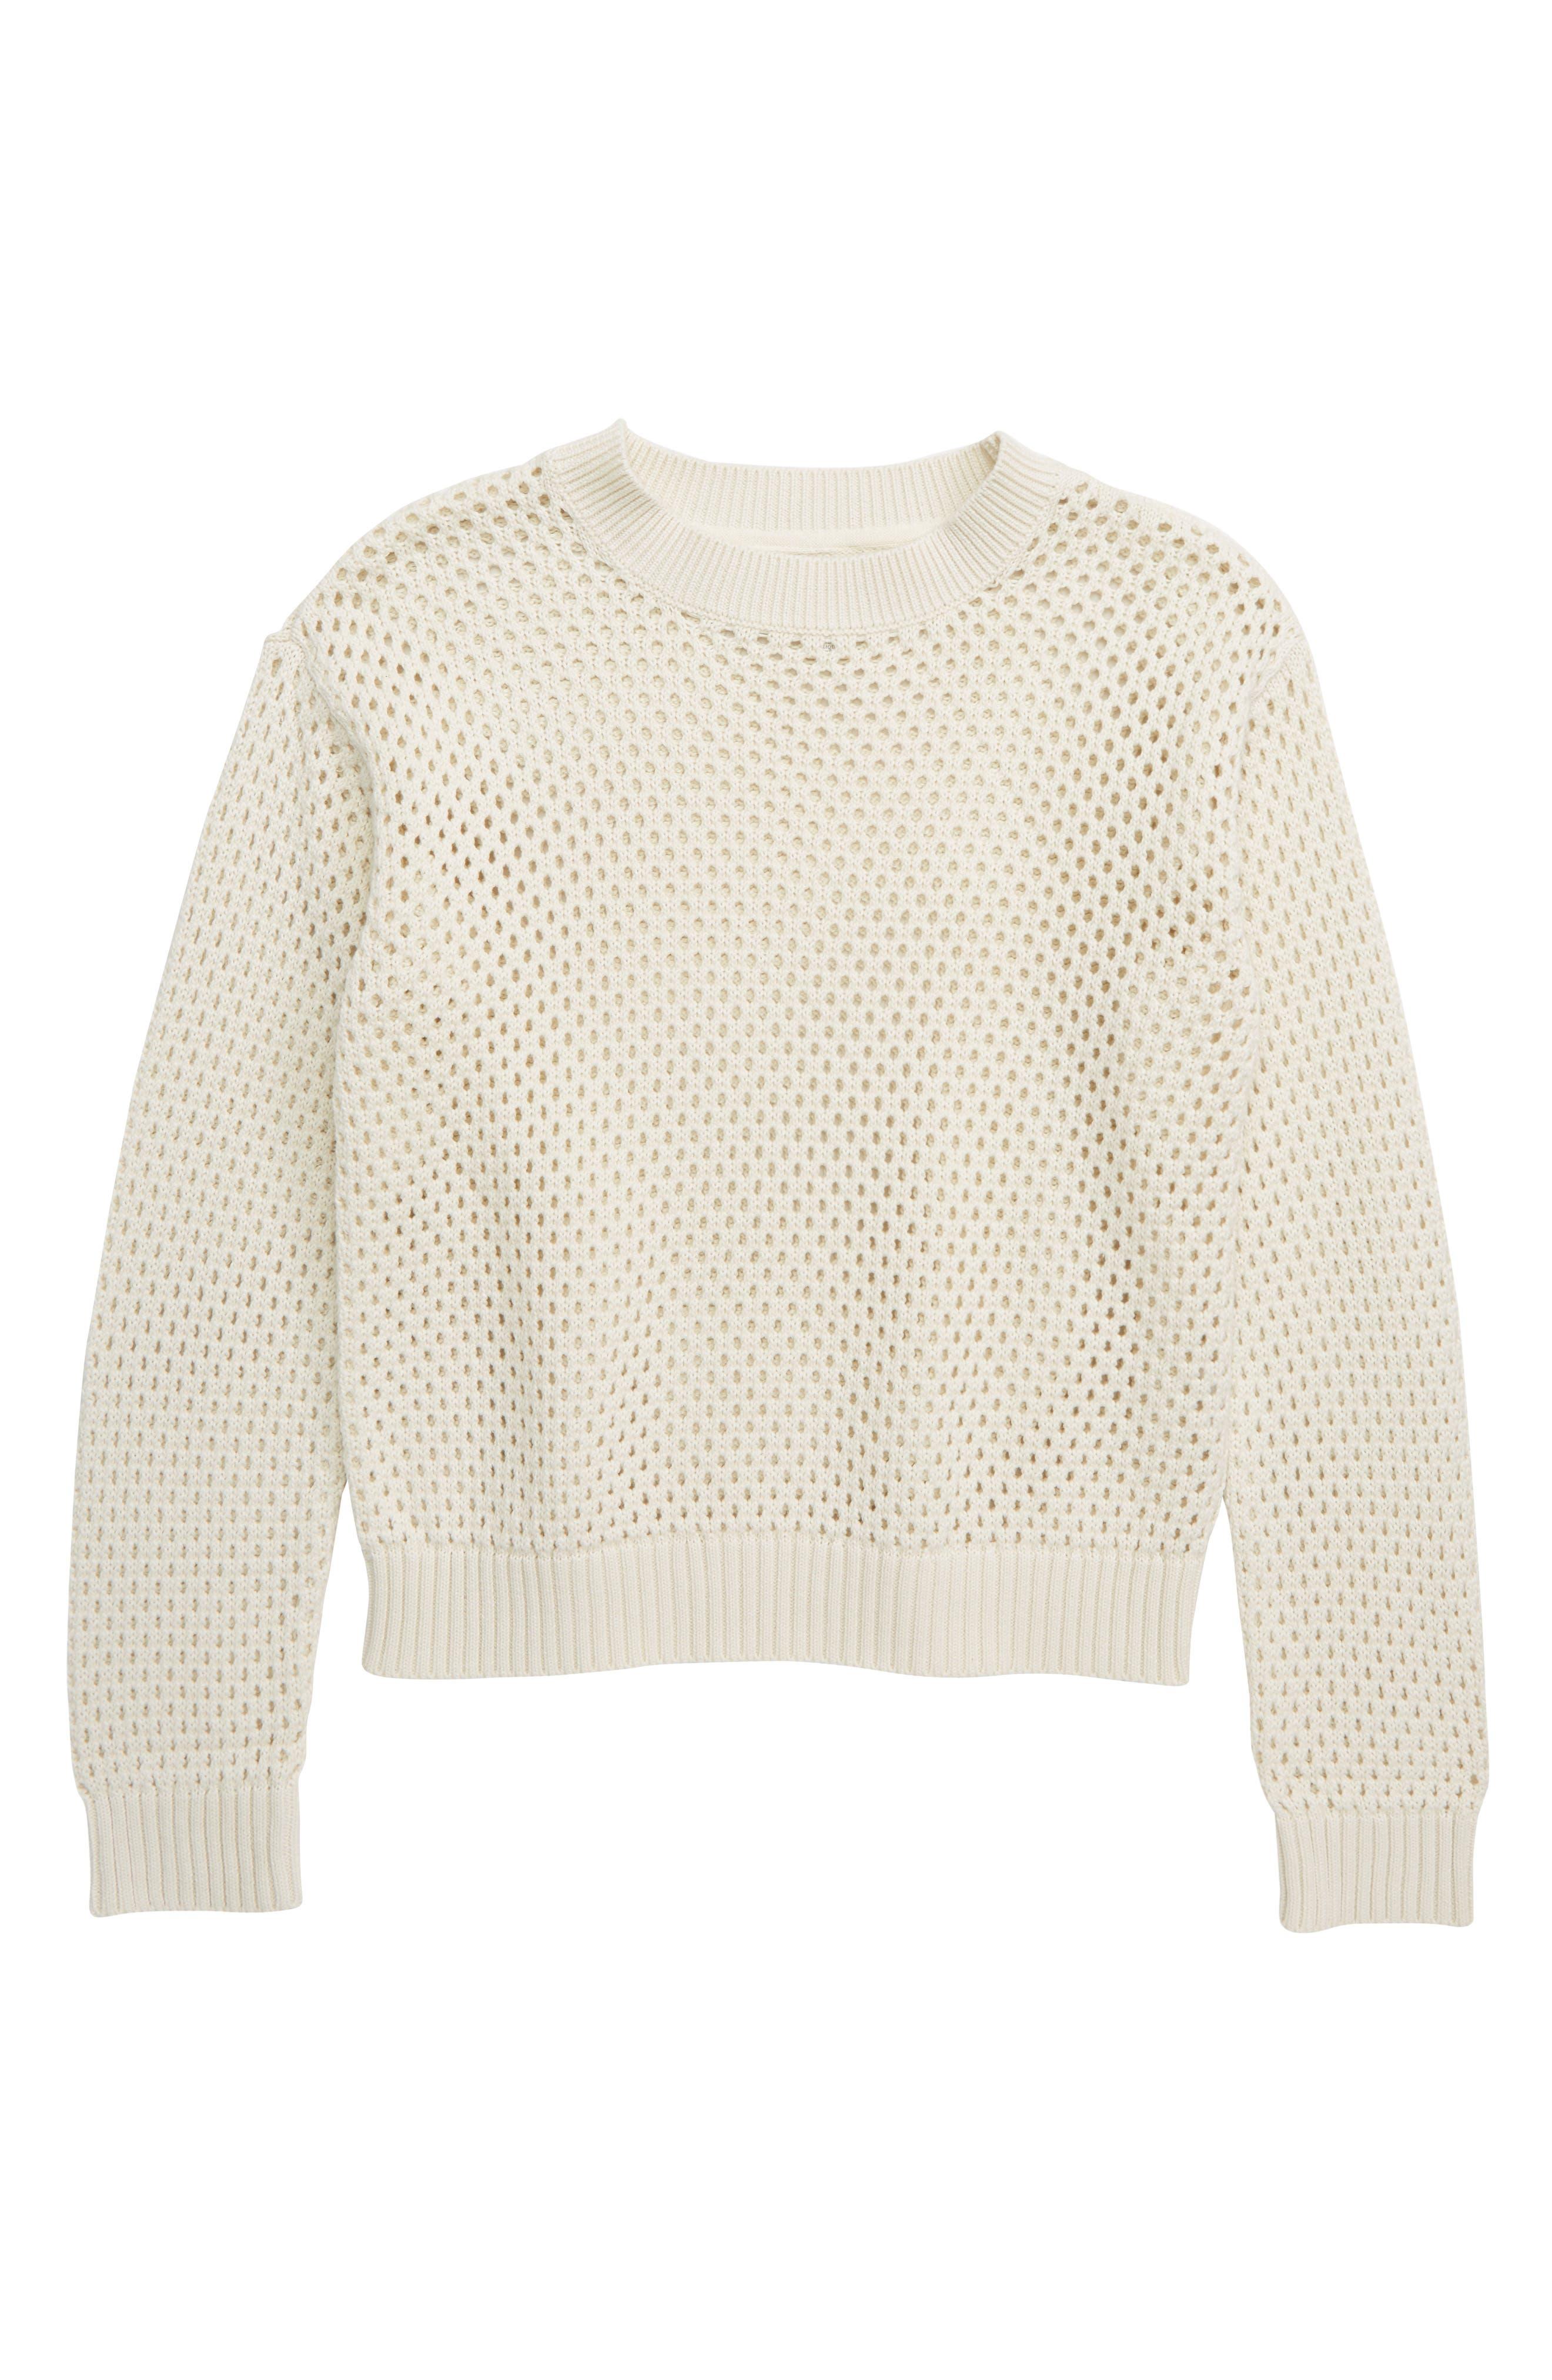 Girls Treasure  Bond Pointelle Sweater Size L (1012)  Ivory